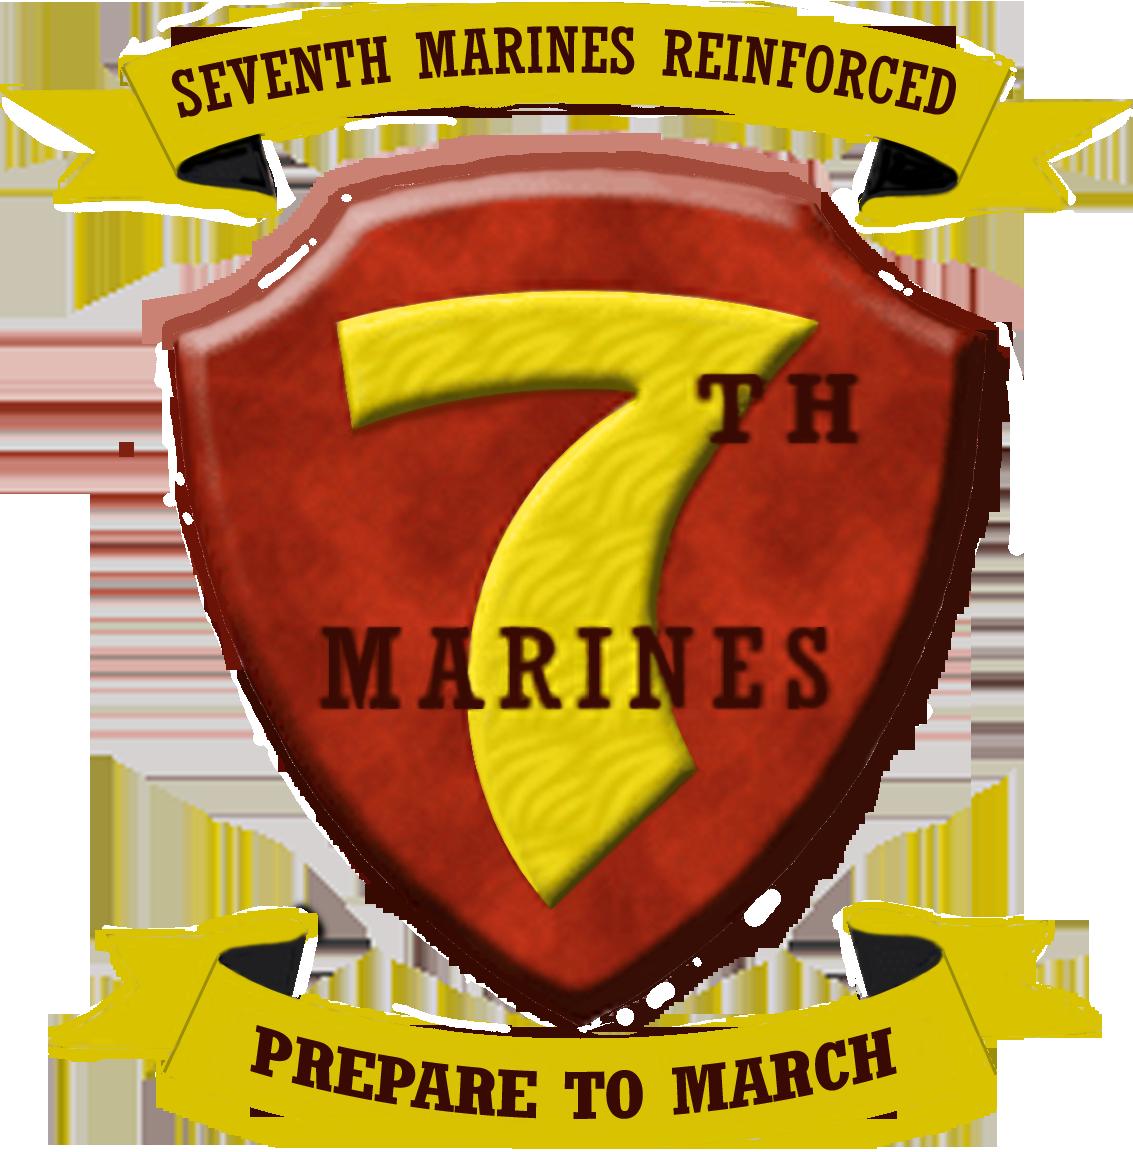 7th Marine Regiment (United States) - Wikipedia